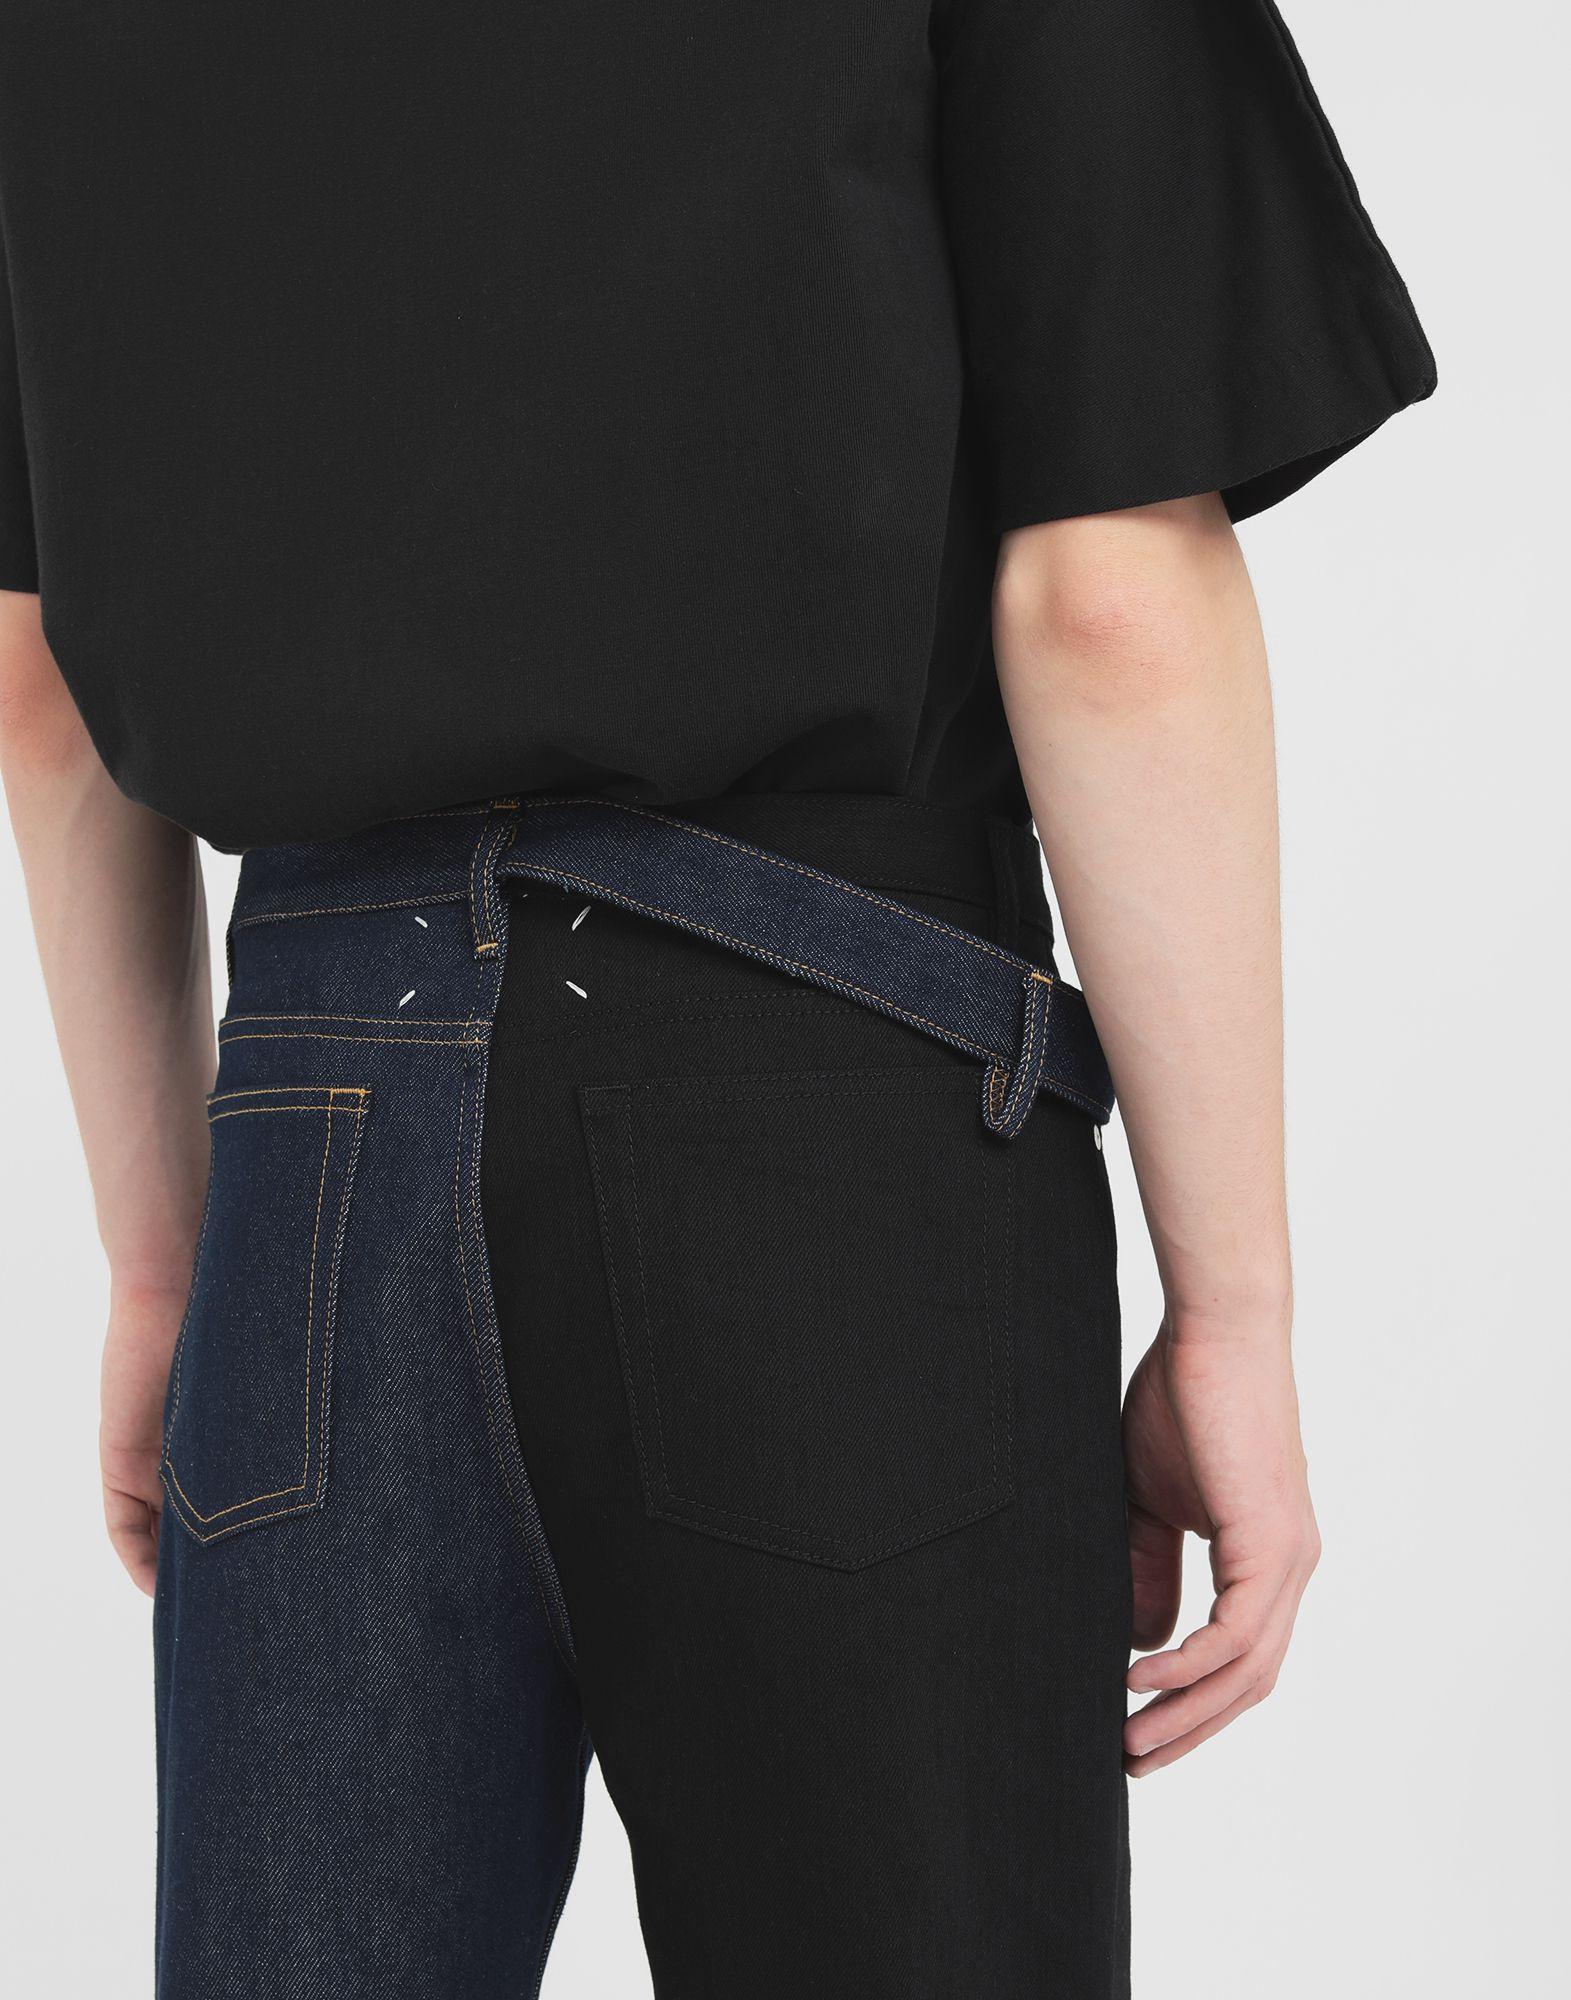 MAISON MARGIELA Spliced jeans Jeans Man b